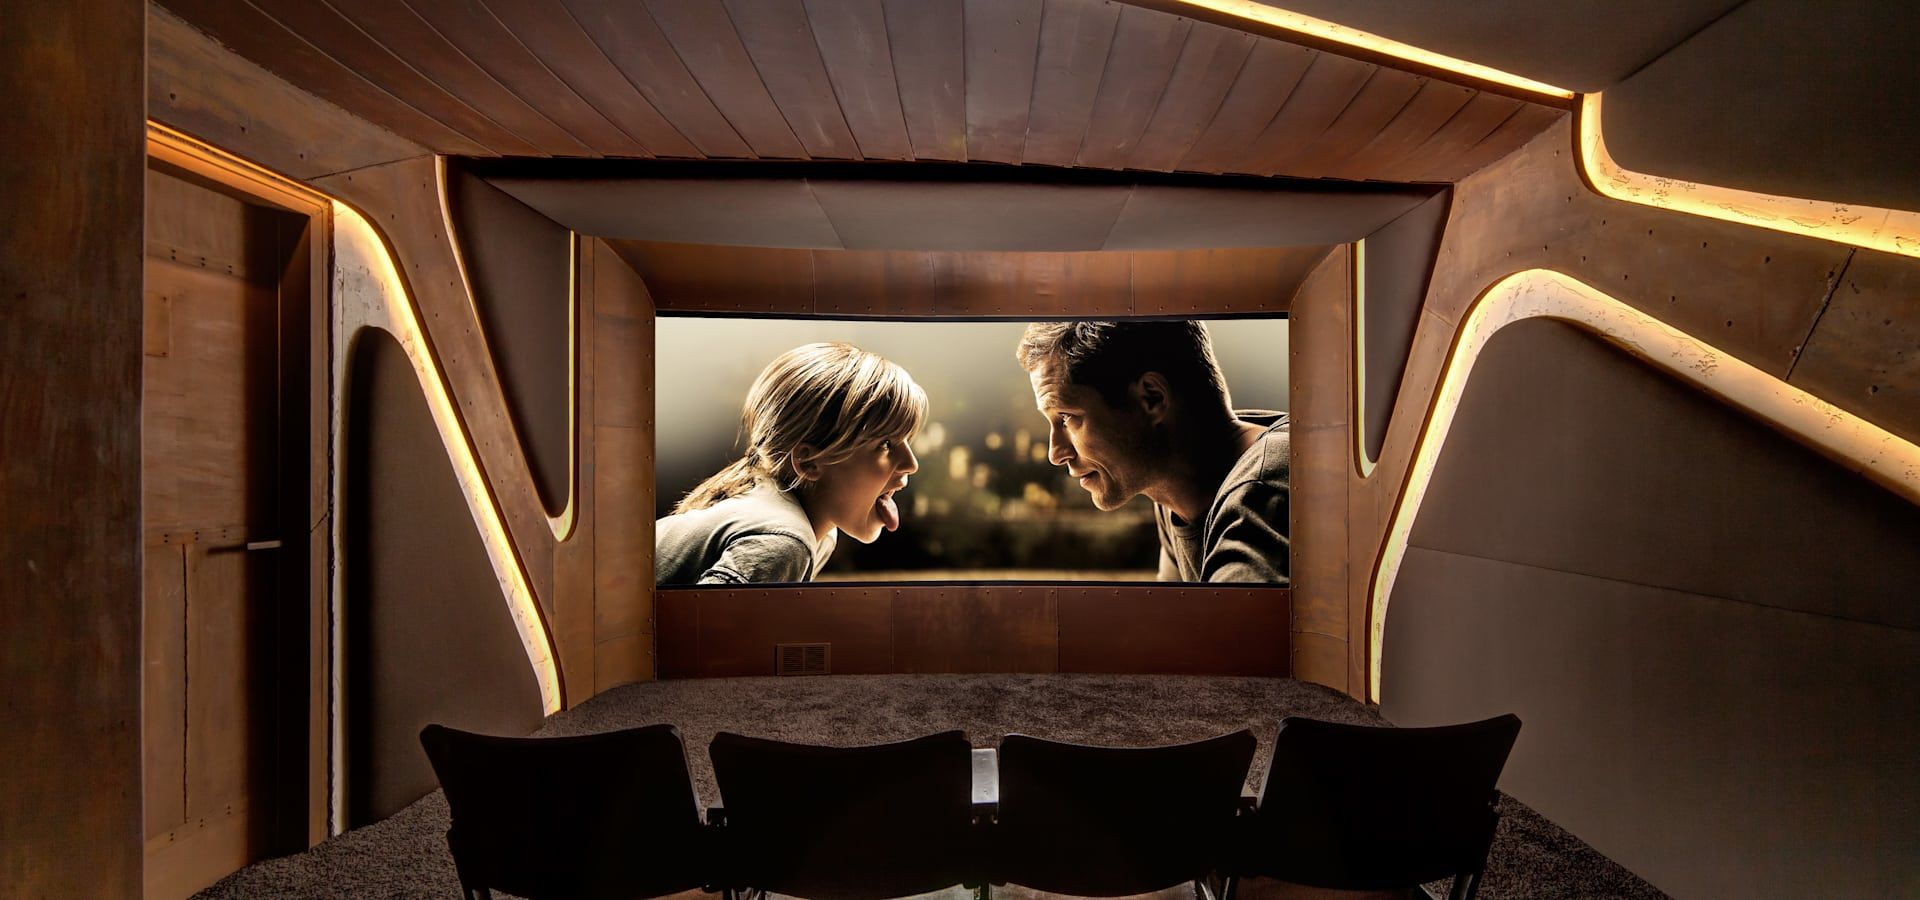 Zumtobel Aphrodite Von Barefoot Design Home Theater Setup Cinema Design Home Cinemas